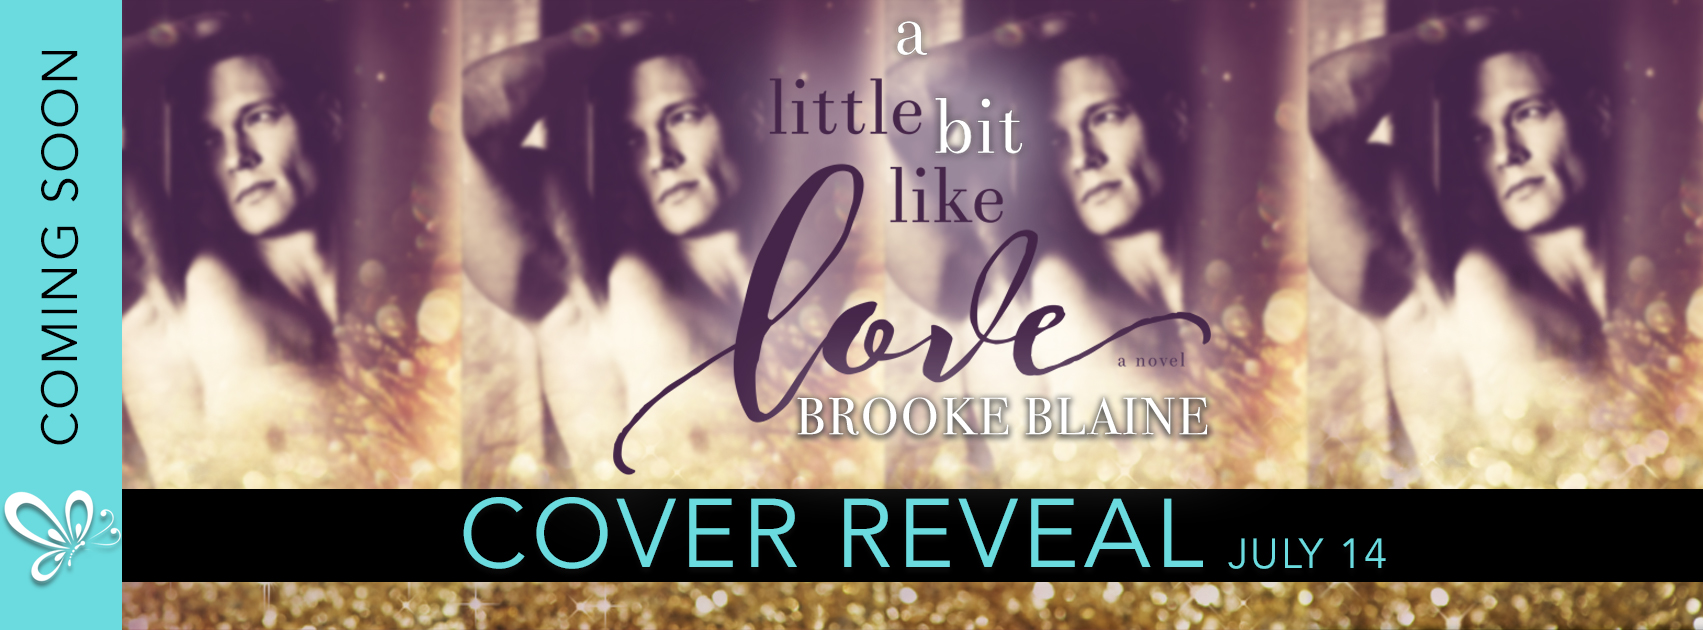 Cover Reveal ♥ A Little Bit Like Love by Brooke Blaine